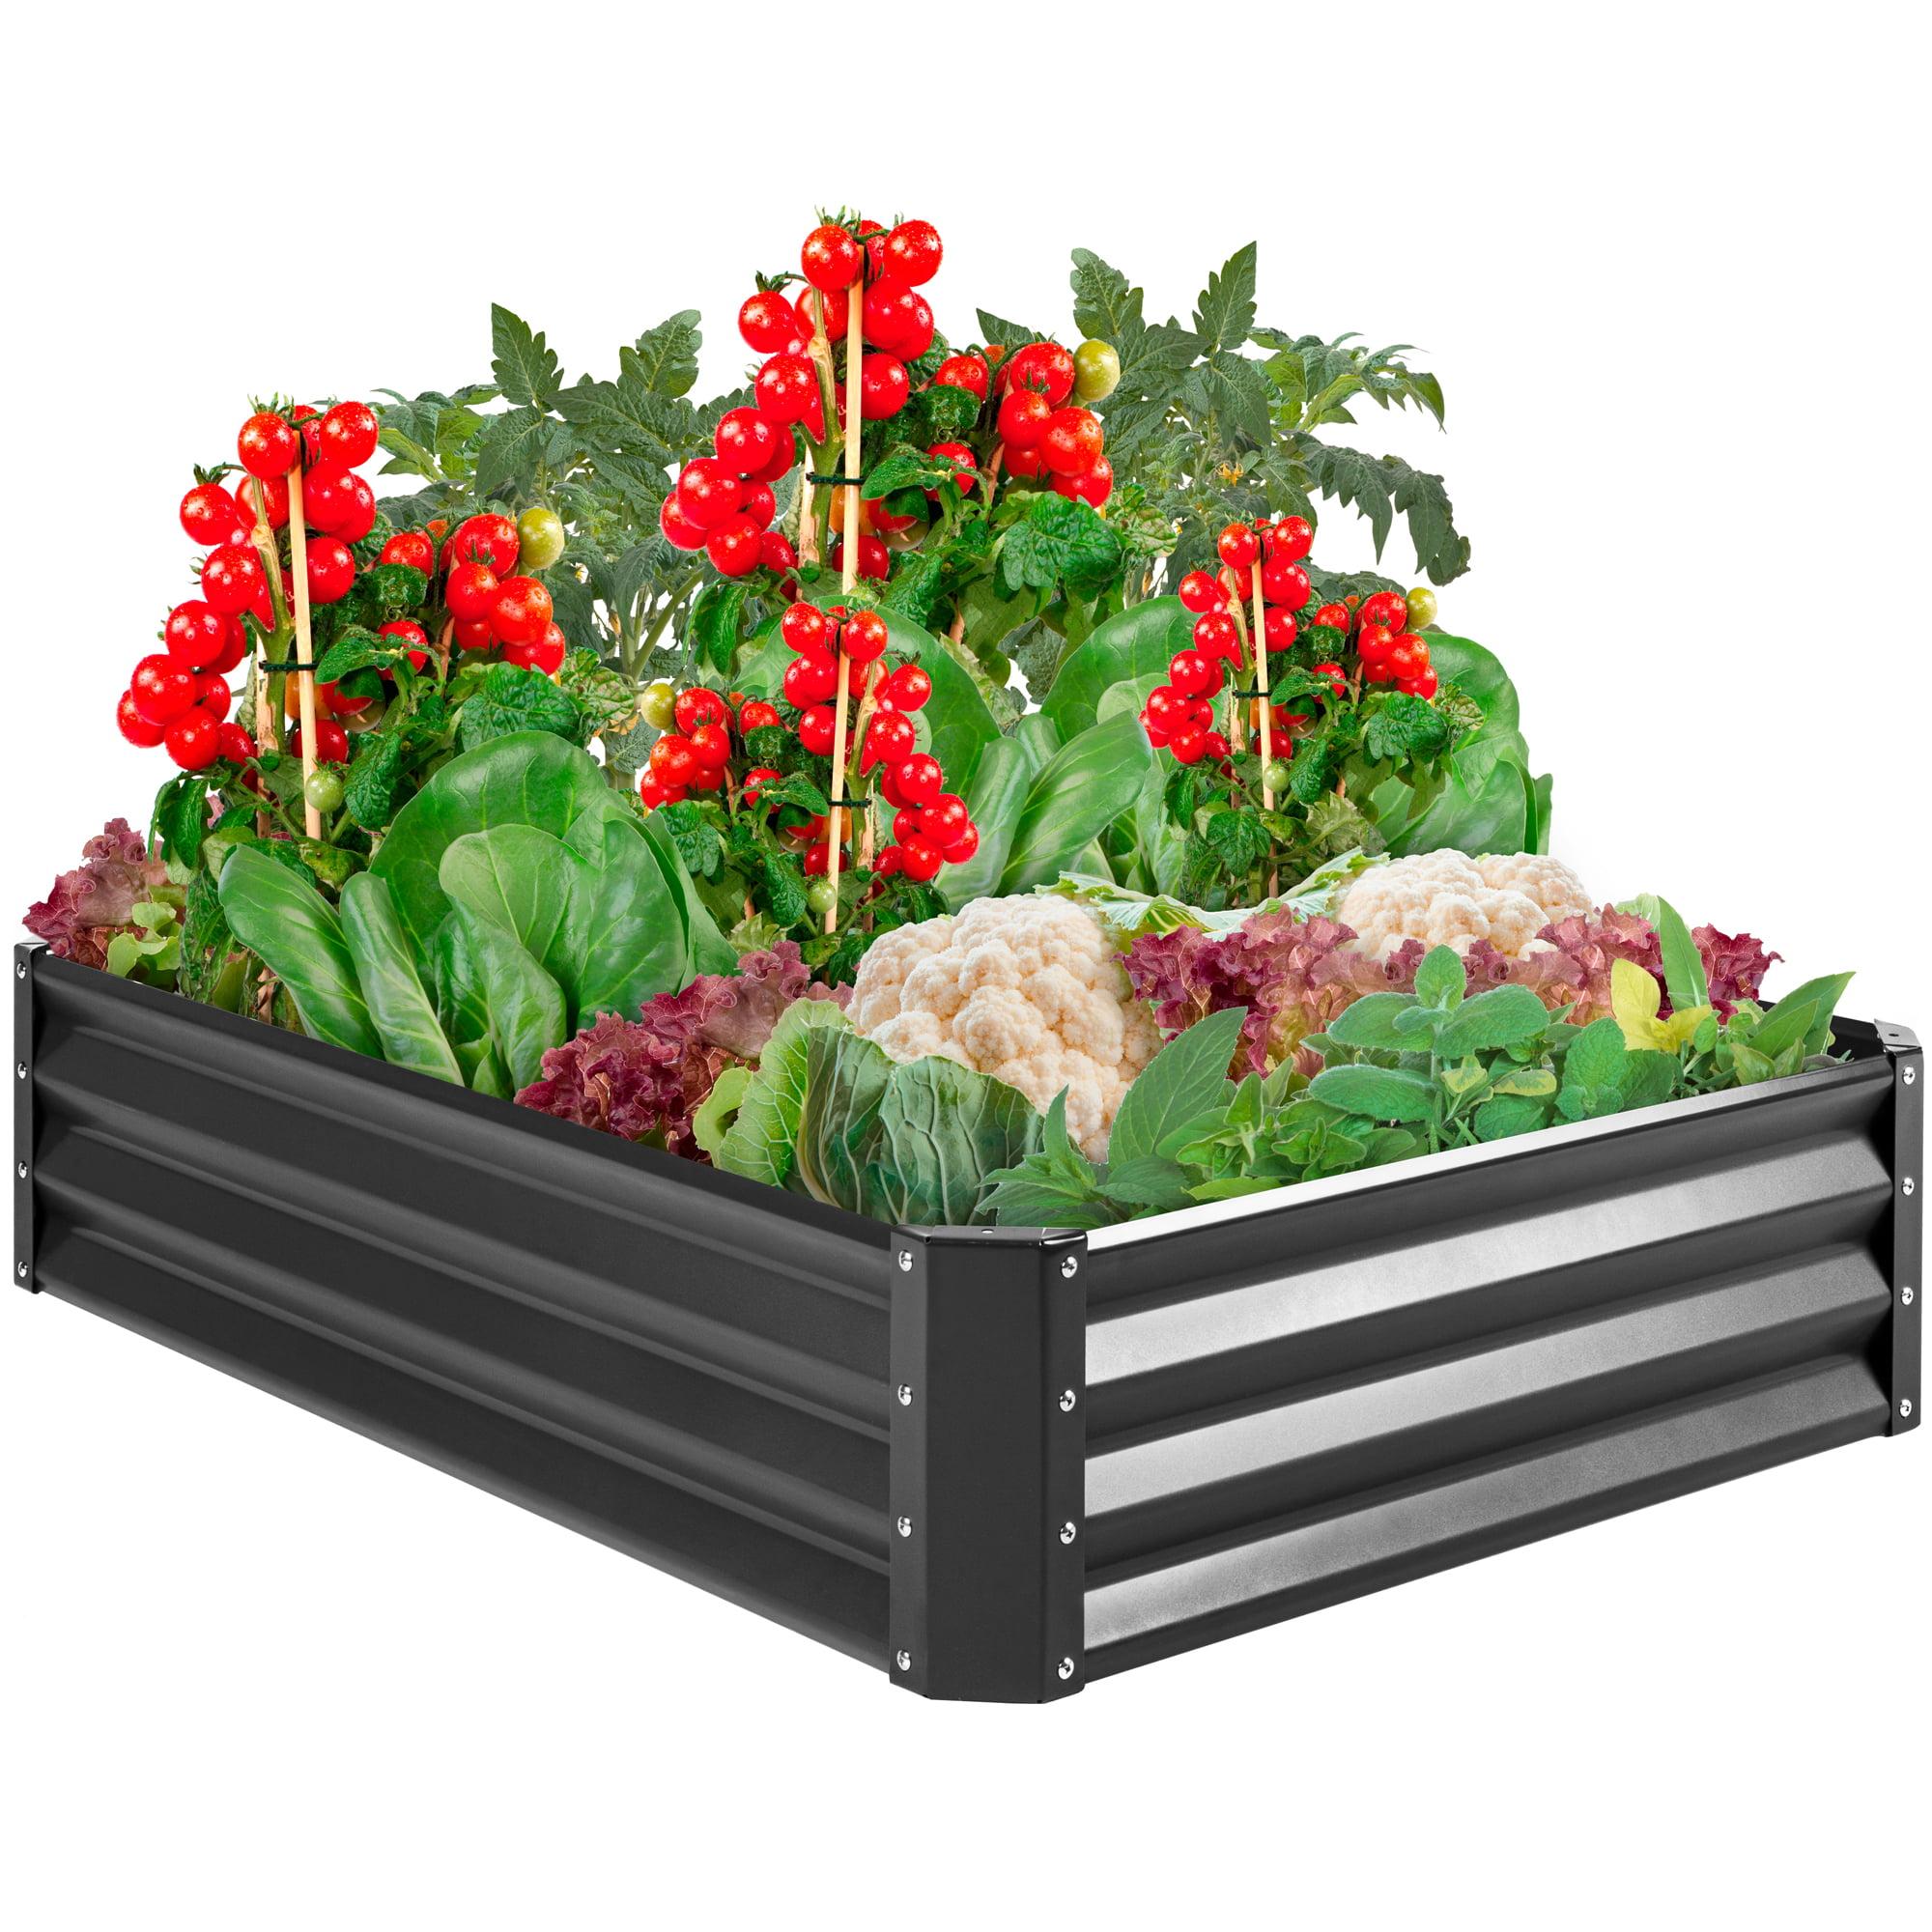 Best Choice Products 4x3x1ft Outdoor Metal Raised Garden Bed For Vegetables Flowers Herbs Plants Dark Gray Walmart Com Walmart Com